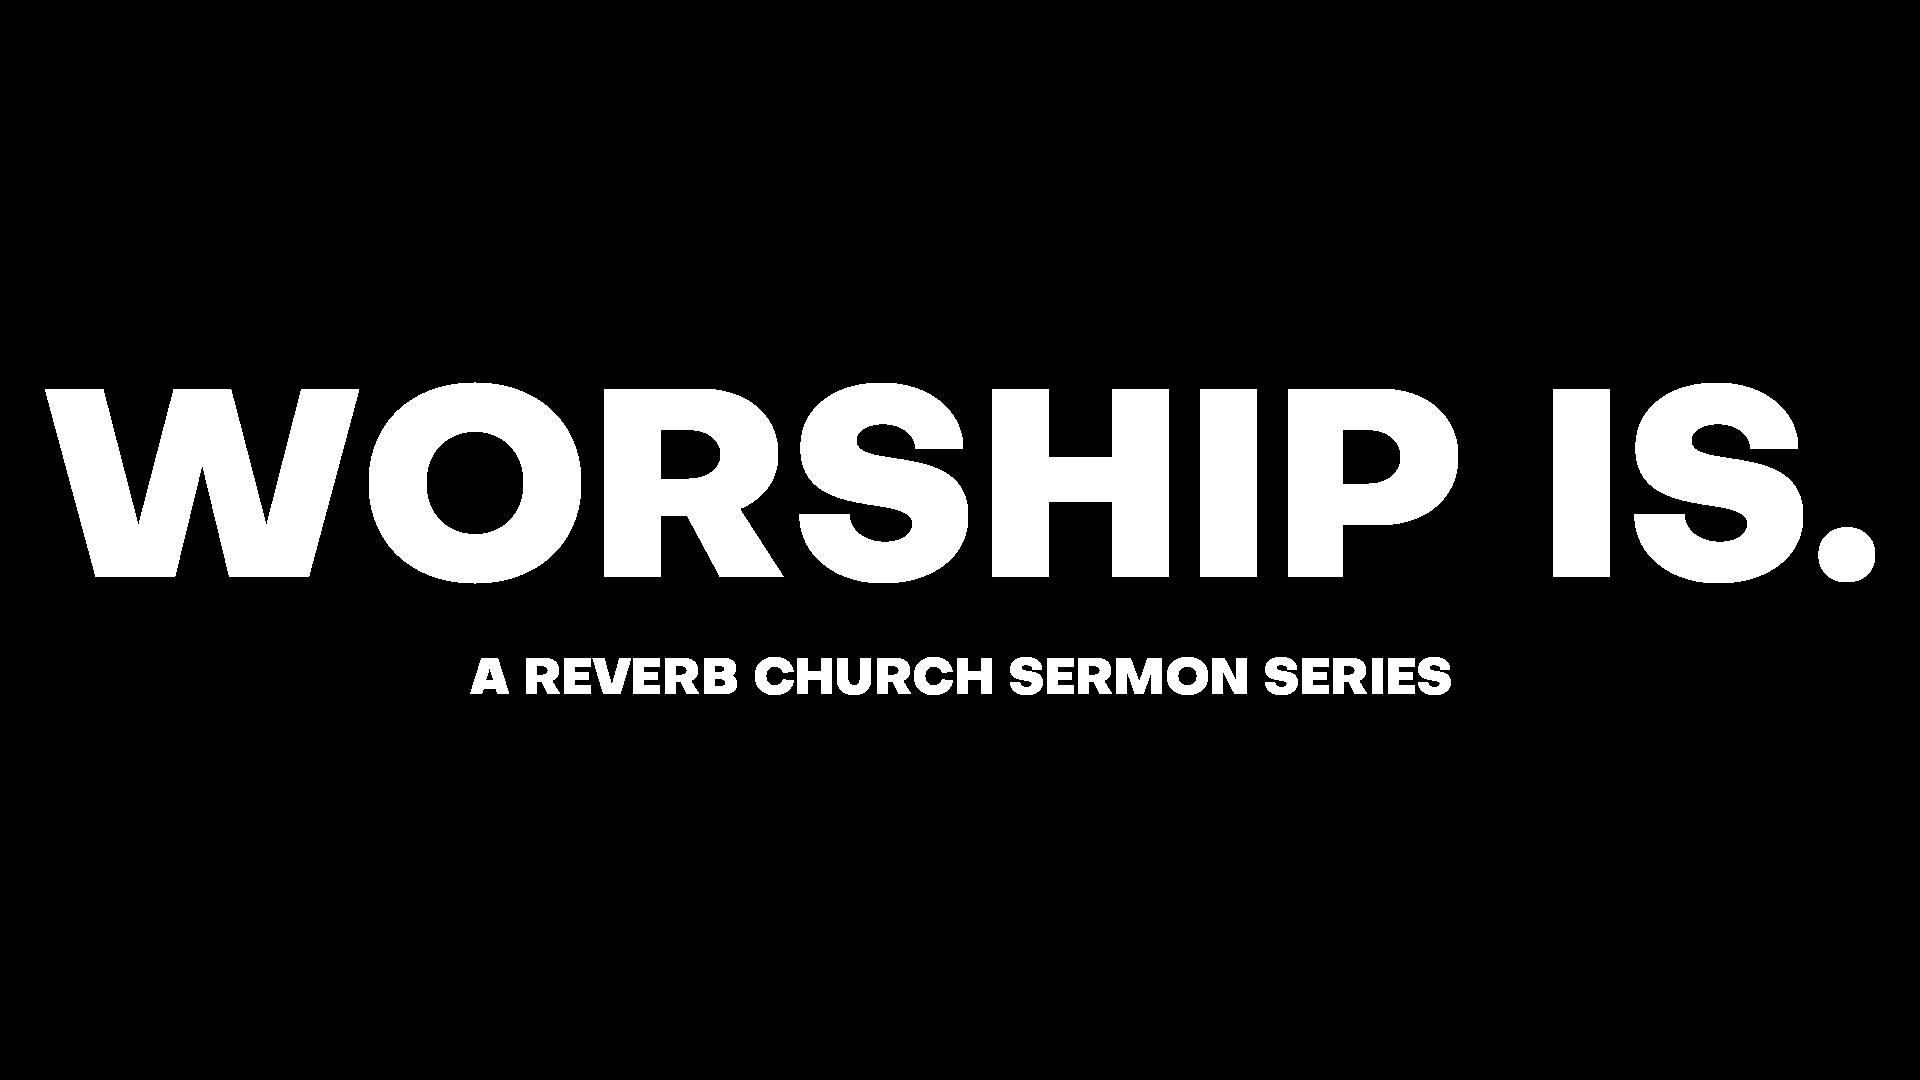 WorshipIs-WebHeader